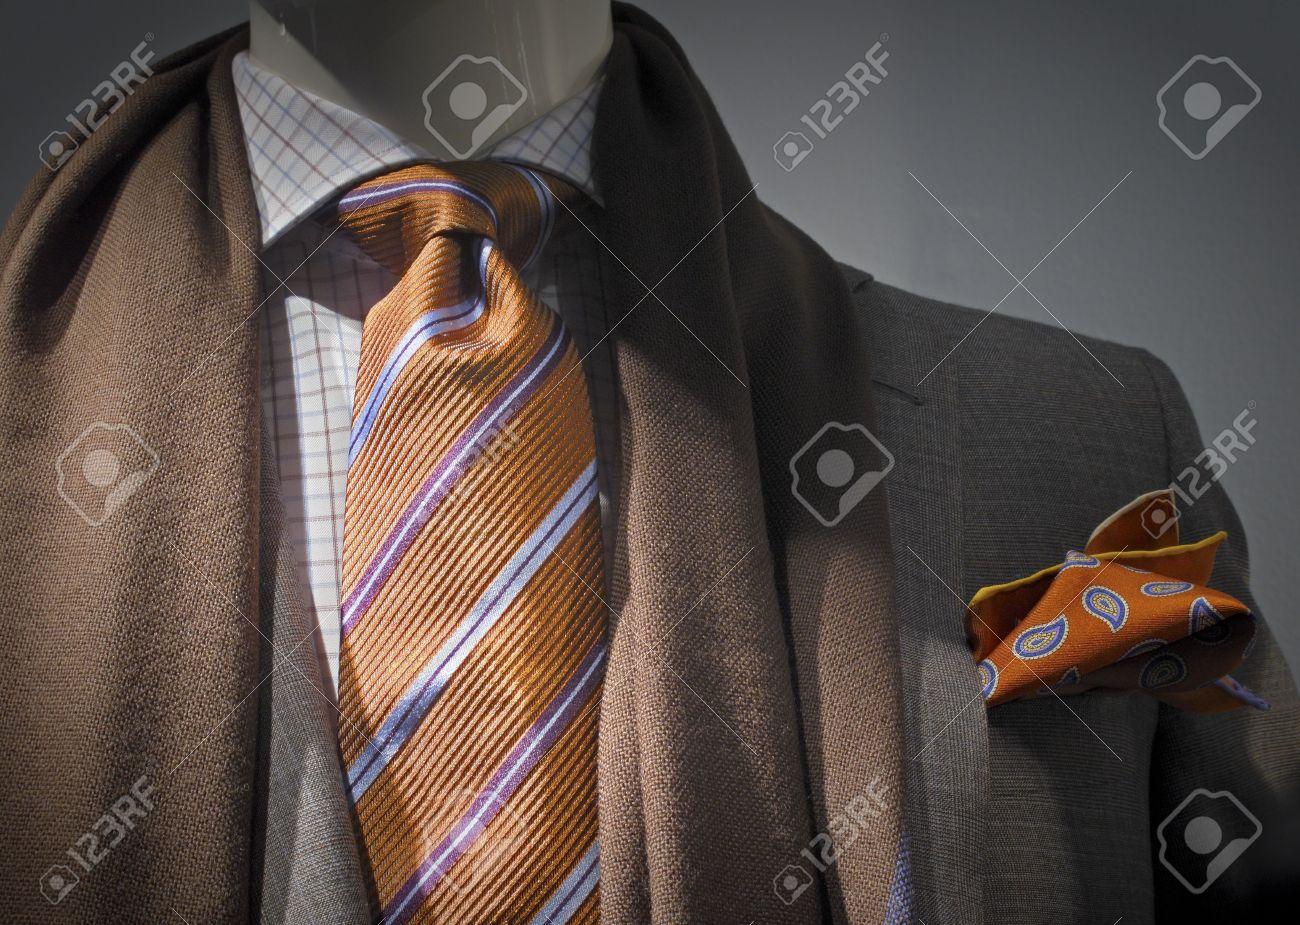 shirt jacke grau gestreift